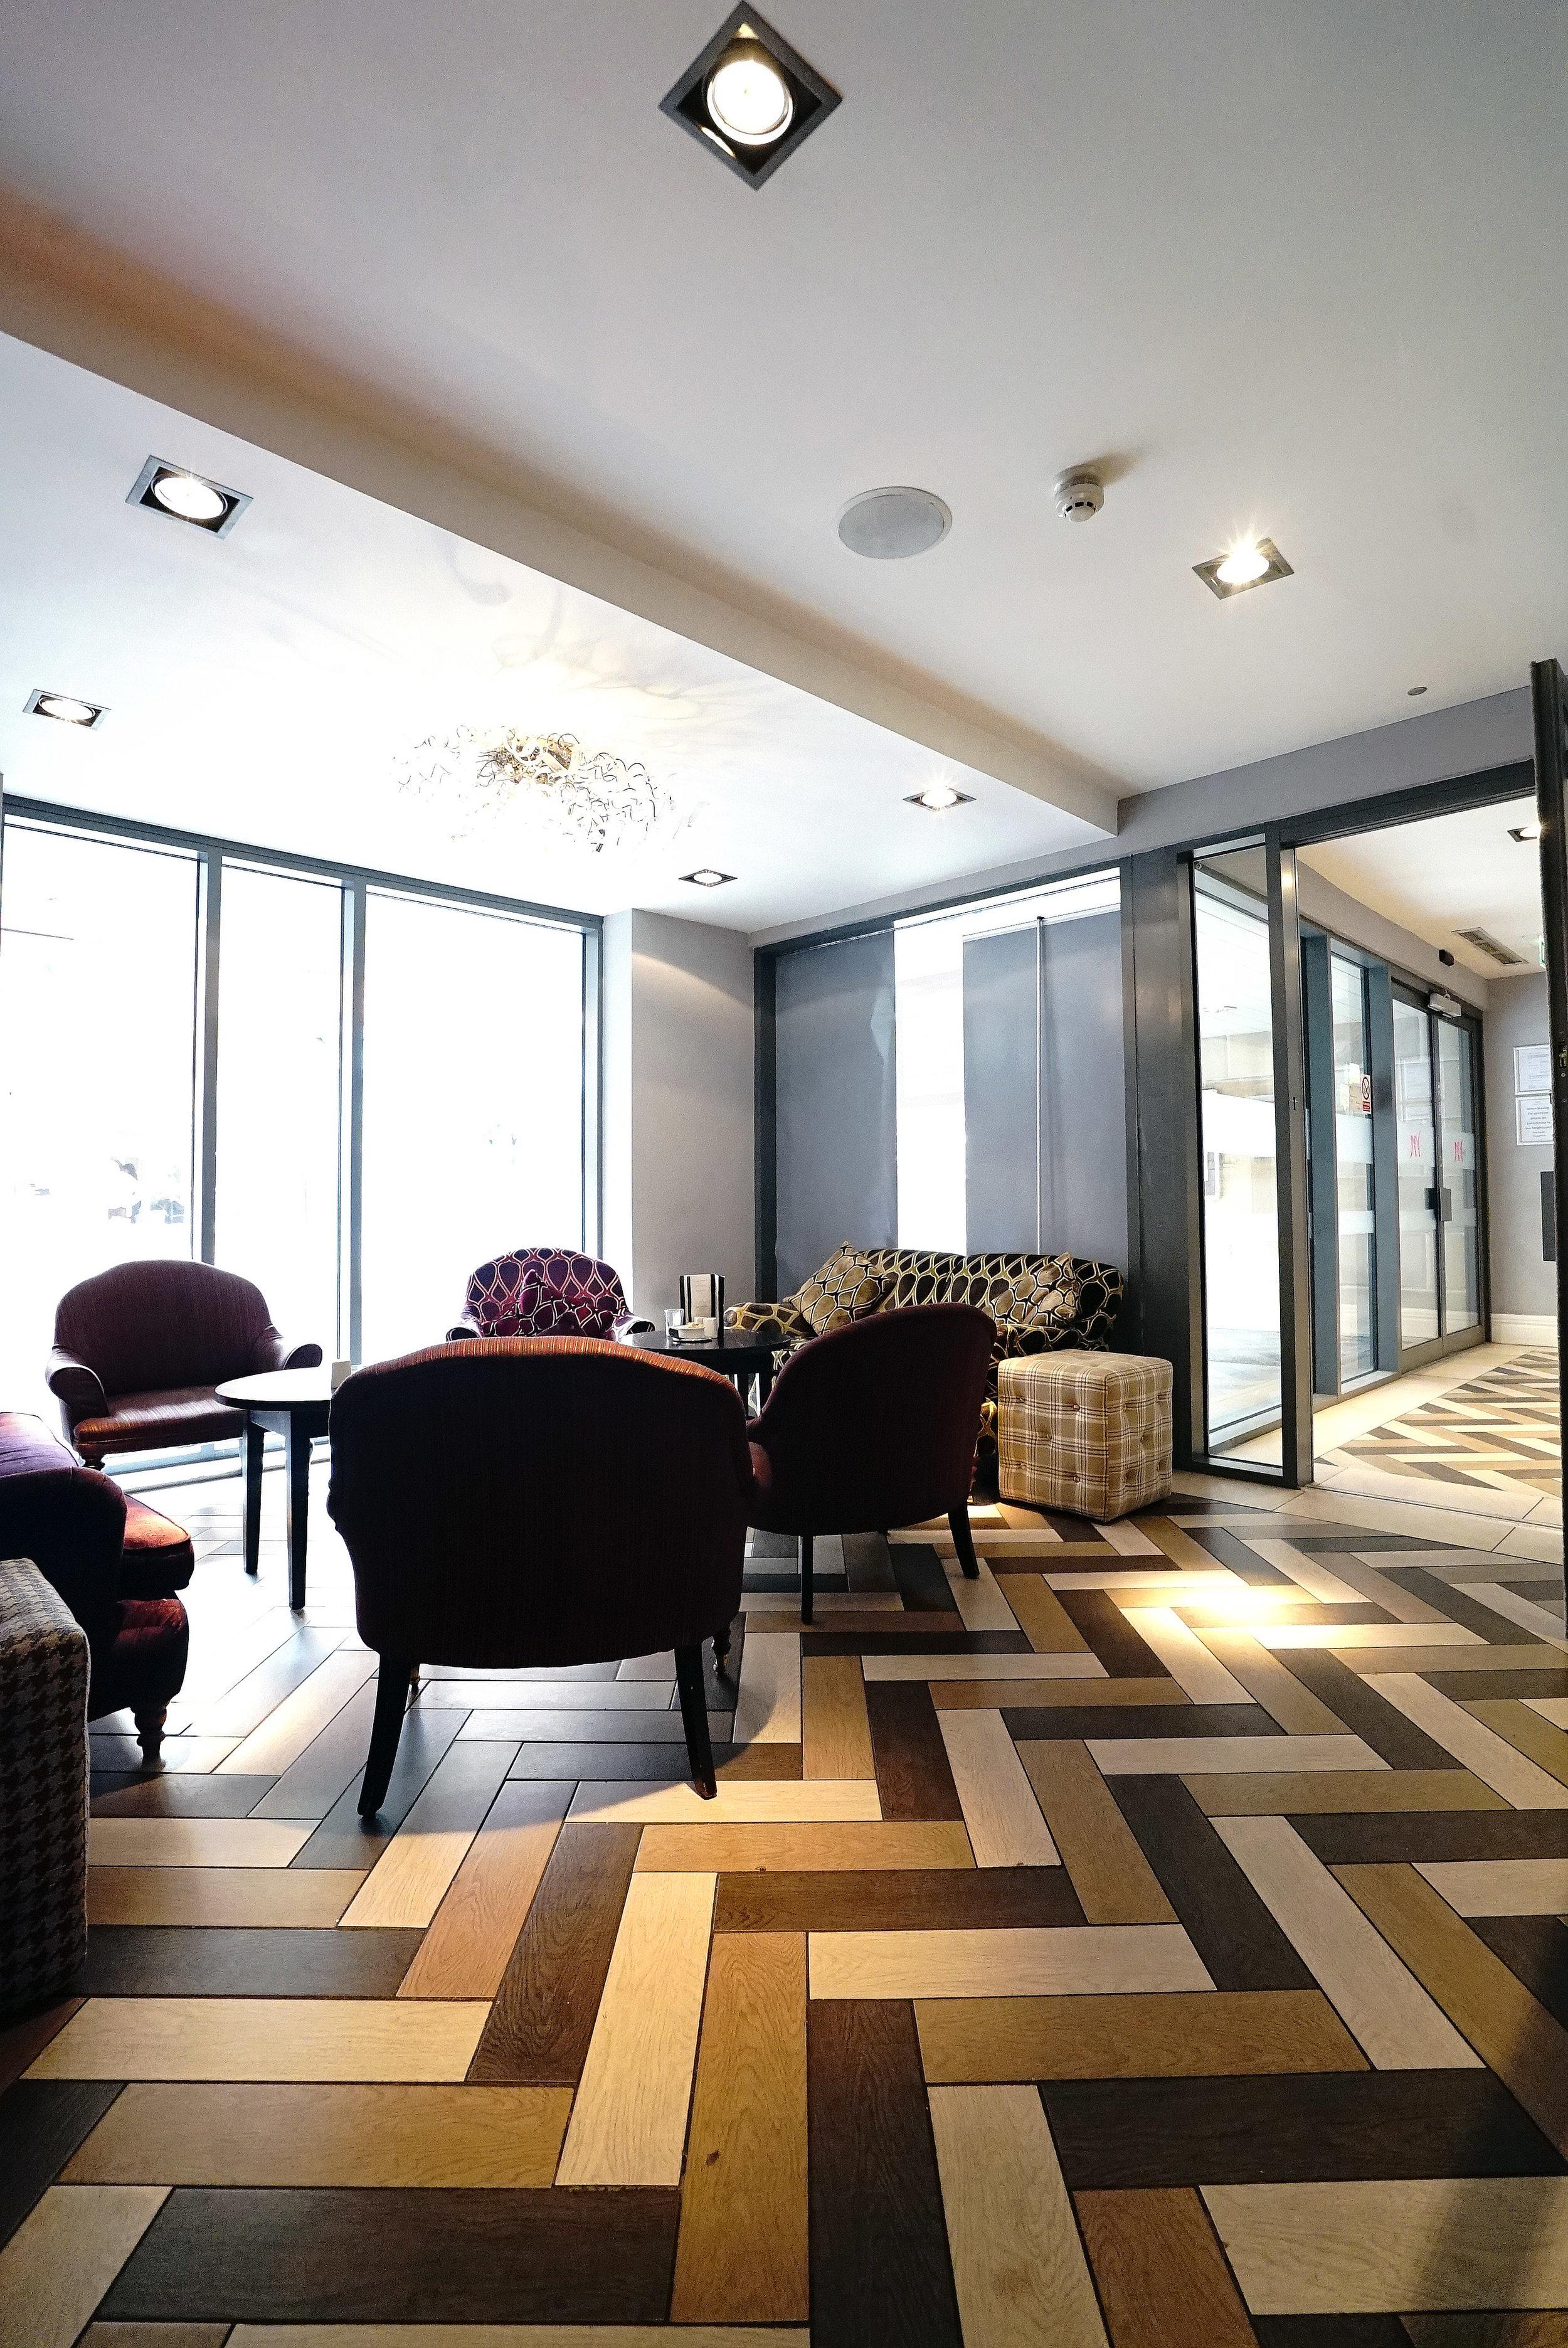 Mercure Darlington Lounge.jpg